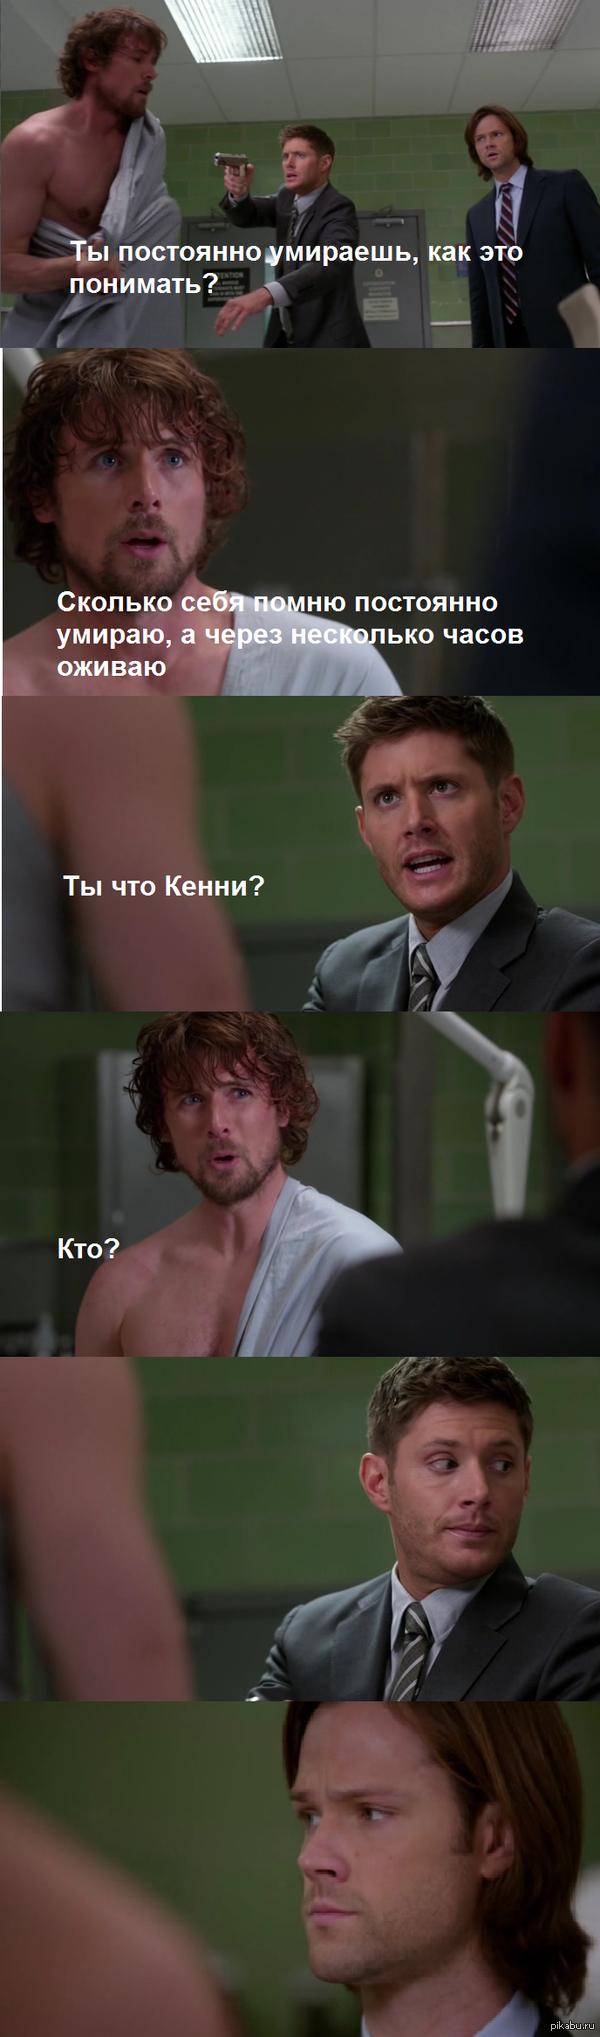 Супернатурал Кенни не знаю может уже кто заливал